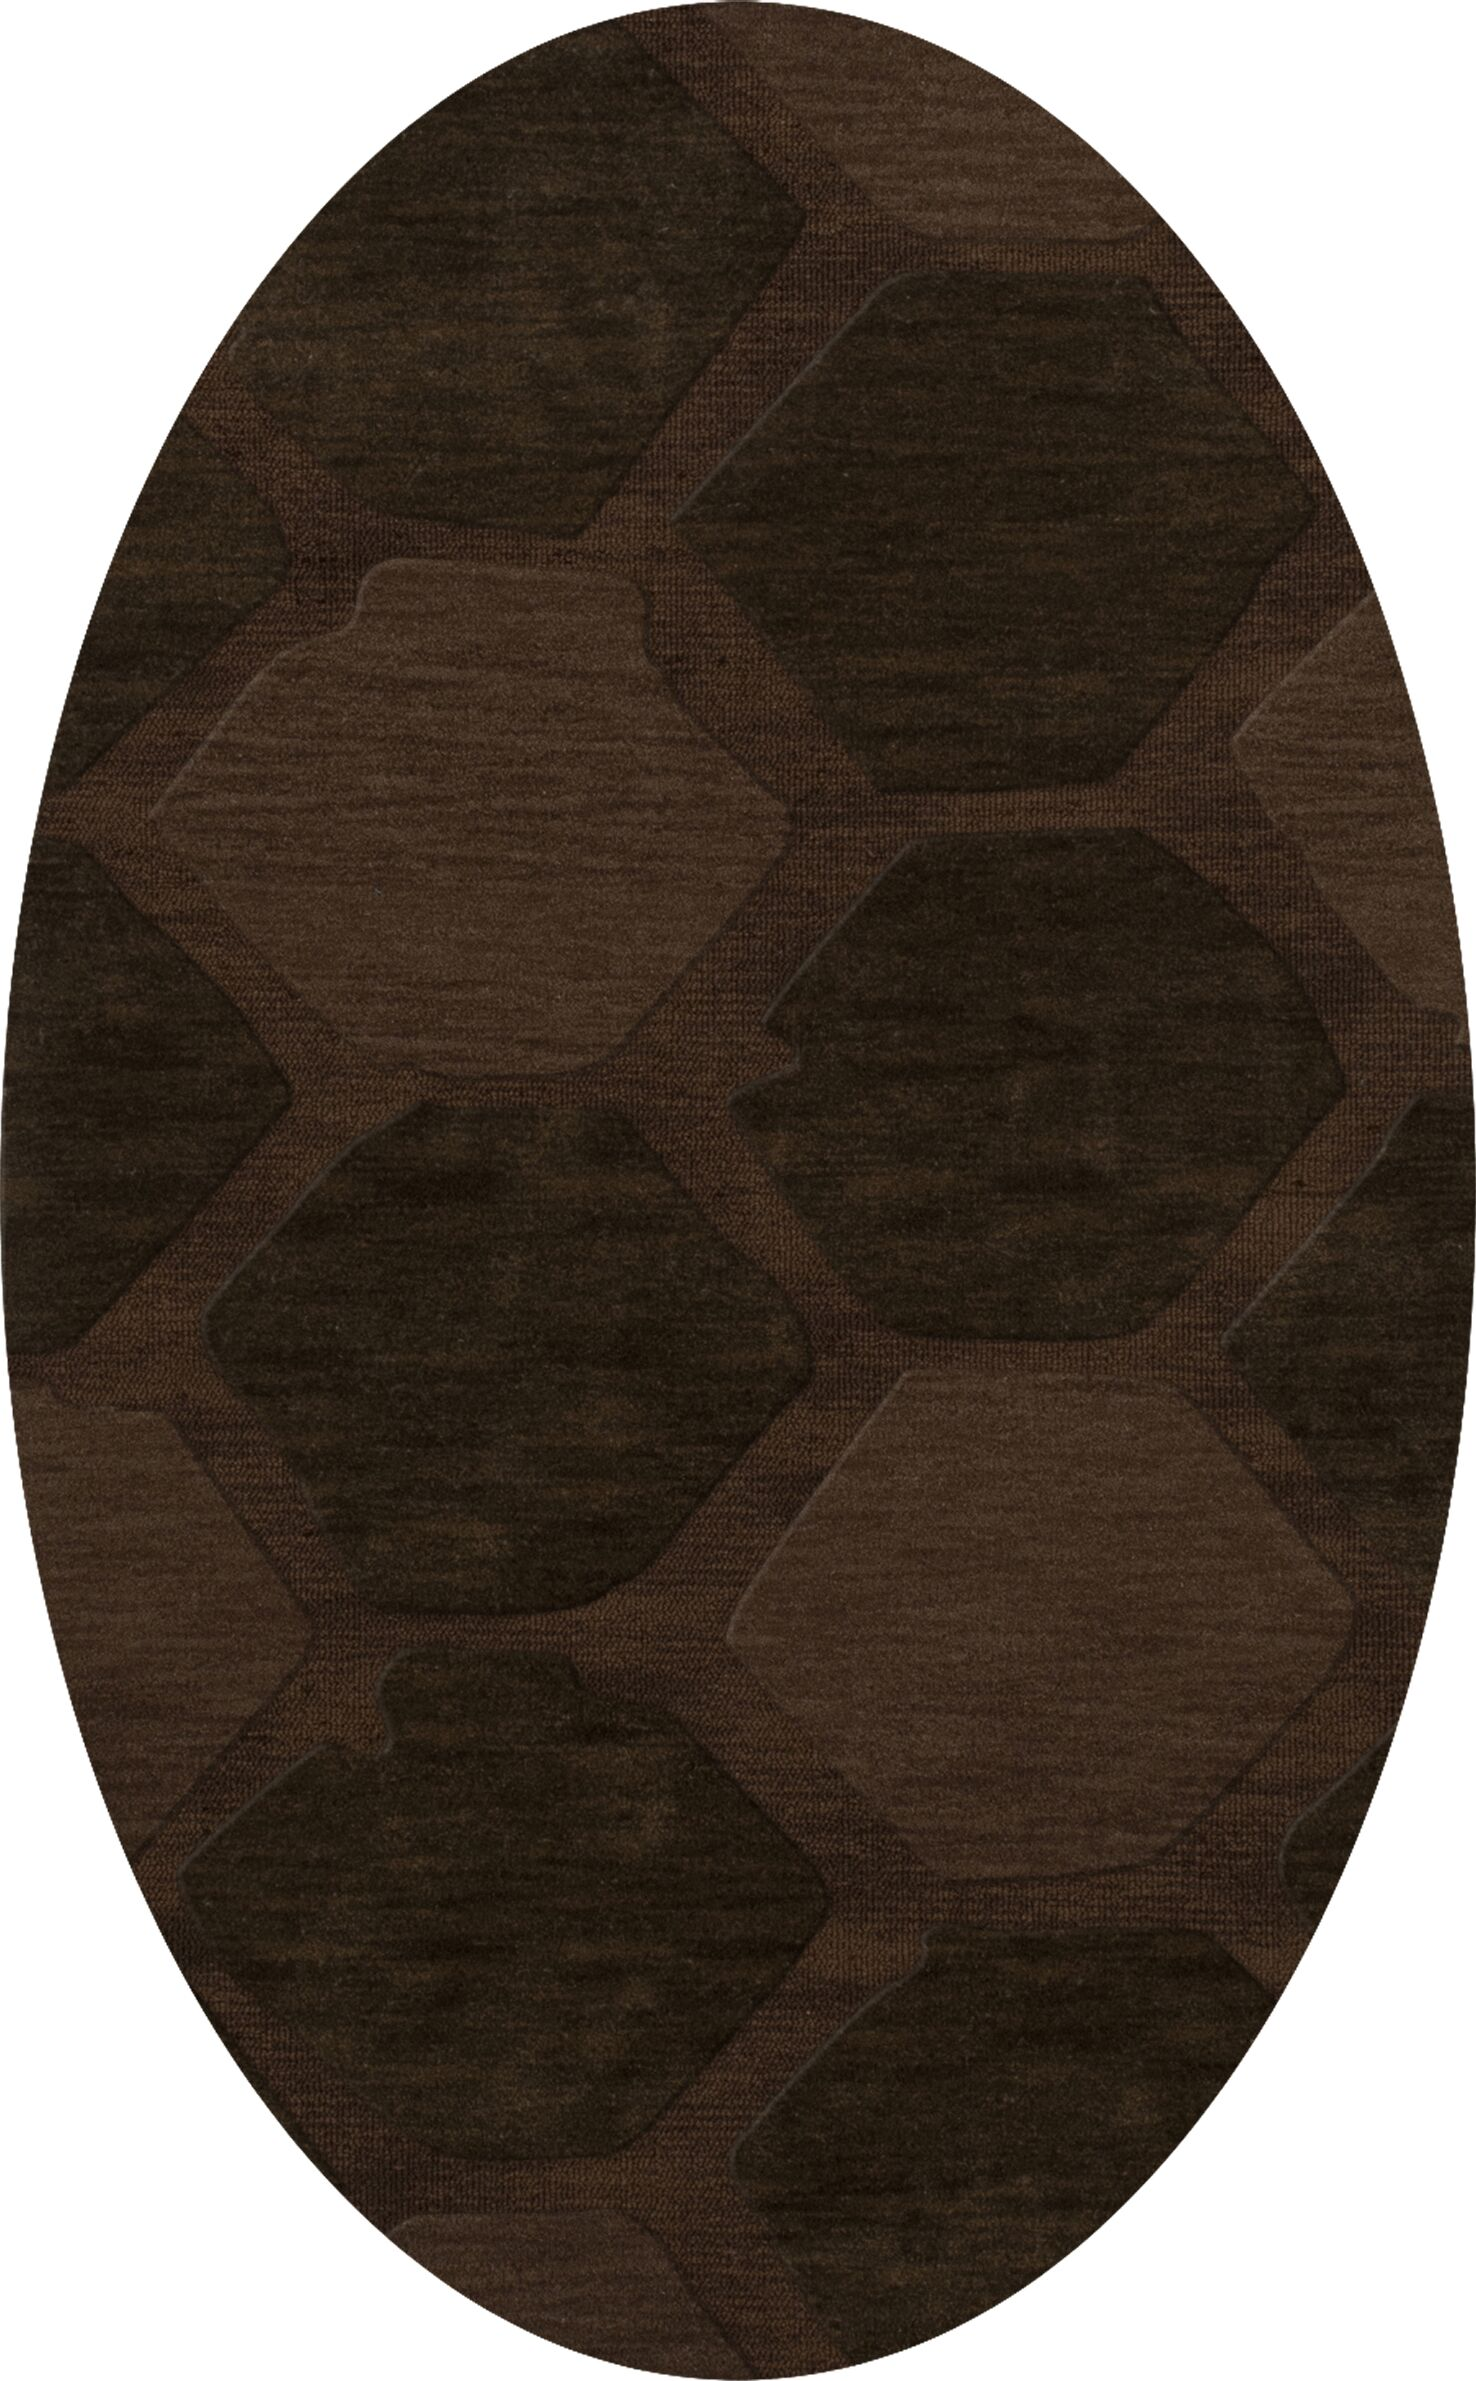 Harmonia Wool Nutmeg Area Rug Rug Size: Oval 9' x 12'